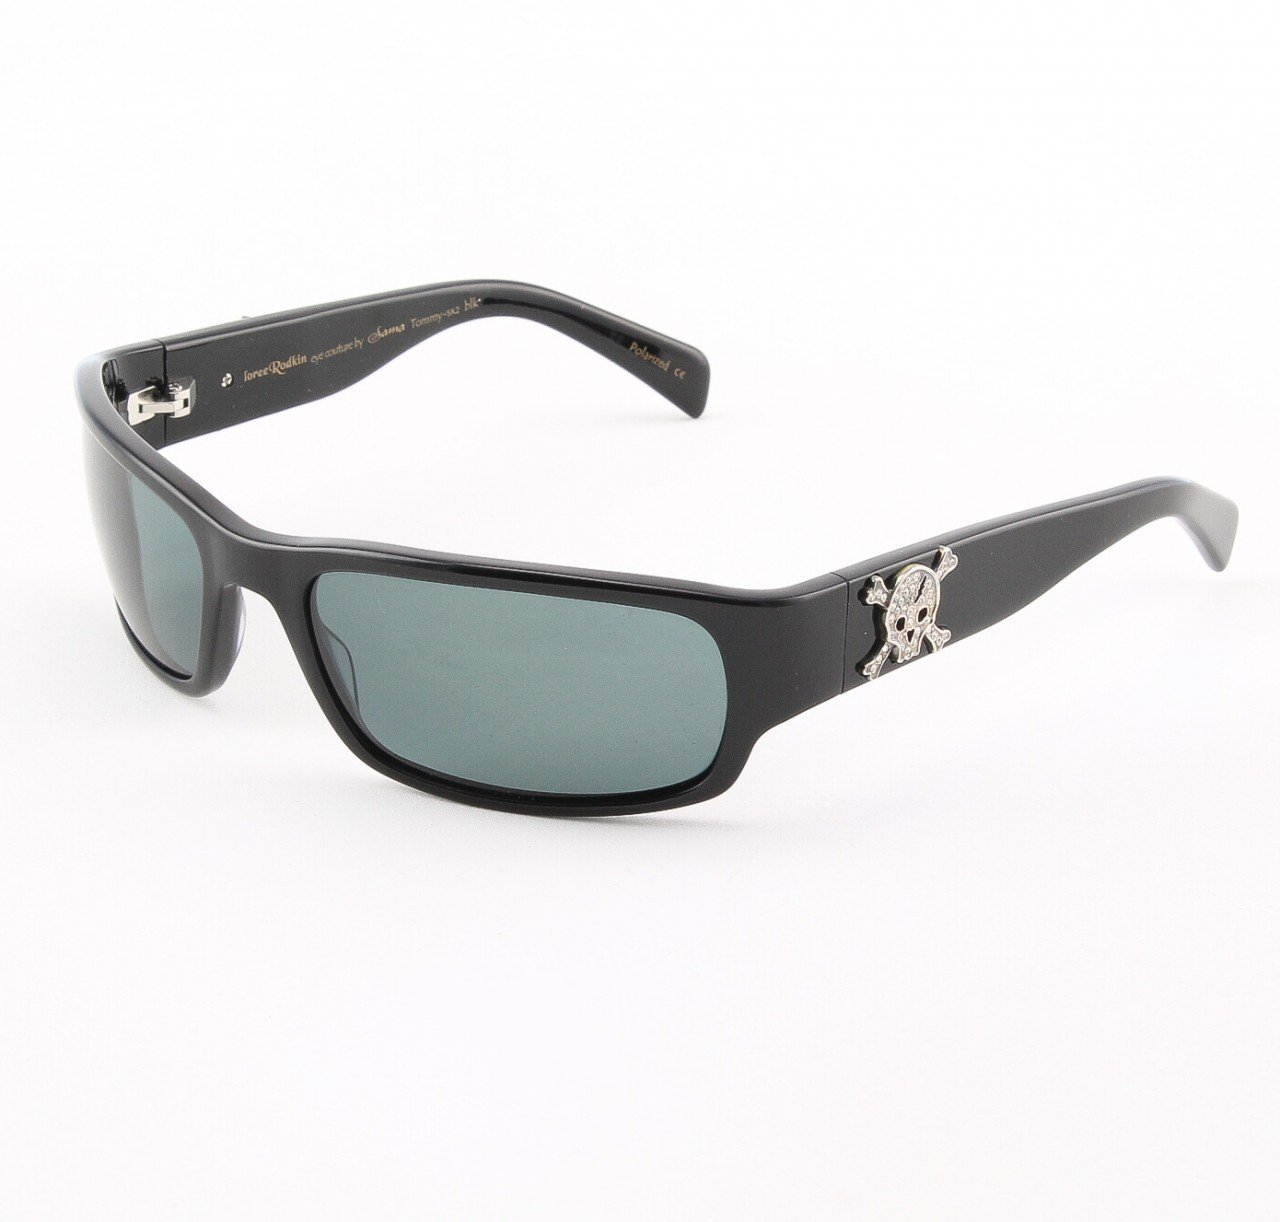 Loree Rodkin Tommy-SX2 Sunglasses Black w/ Polarized Lenses, Sterling Silver, Swarovski Crystals